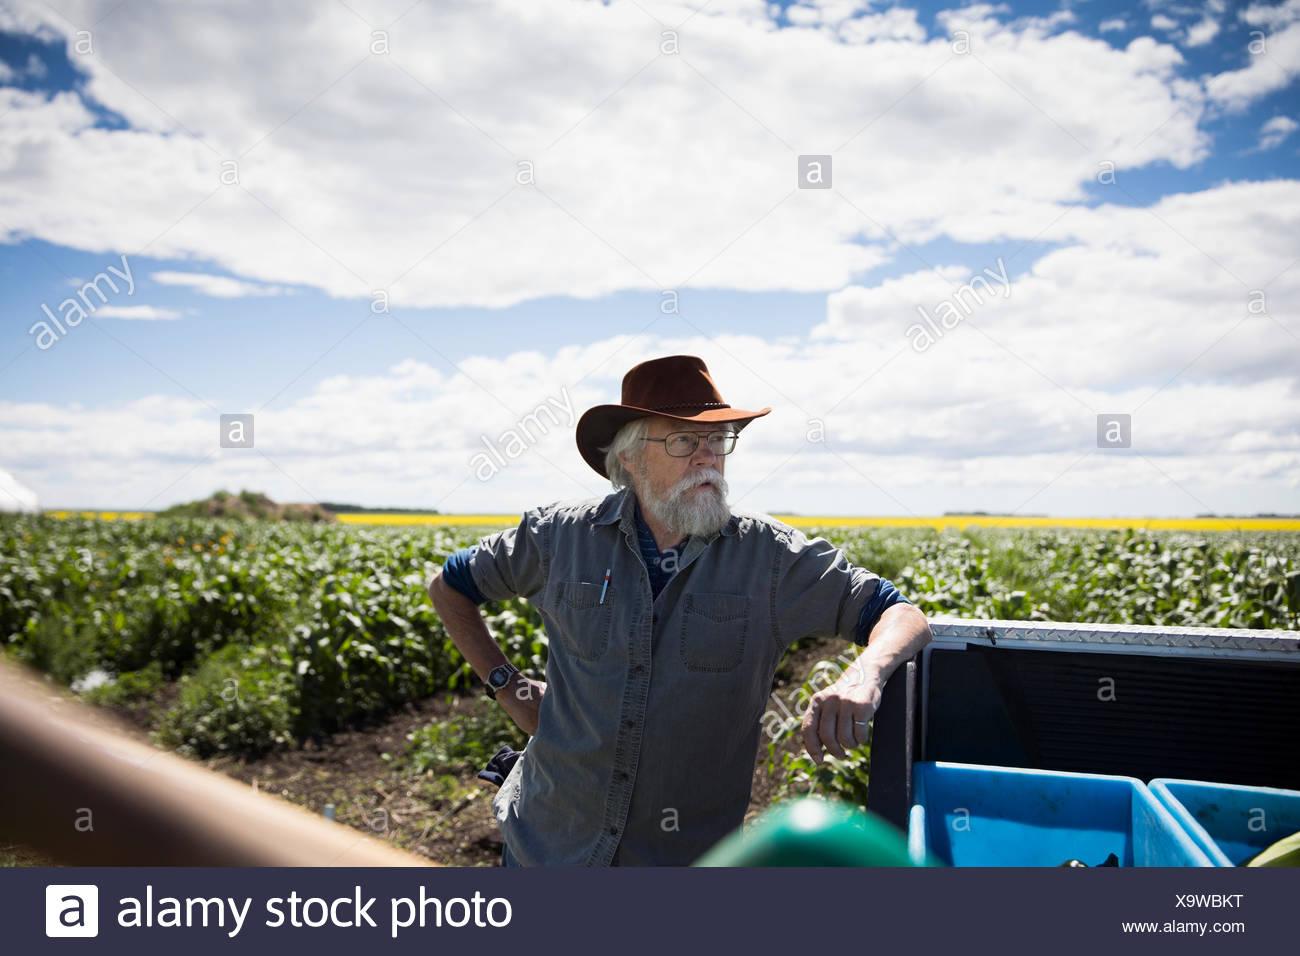 Senior male farmer leaning on truck on sunny farm - Stock Image